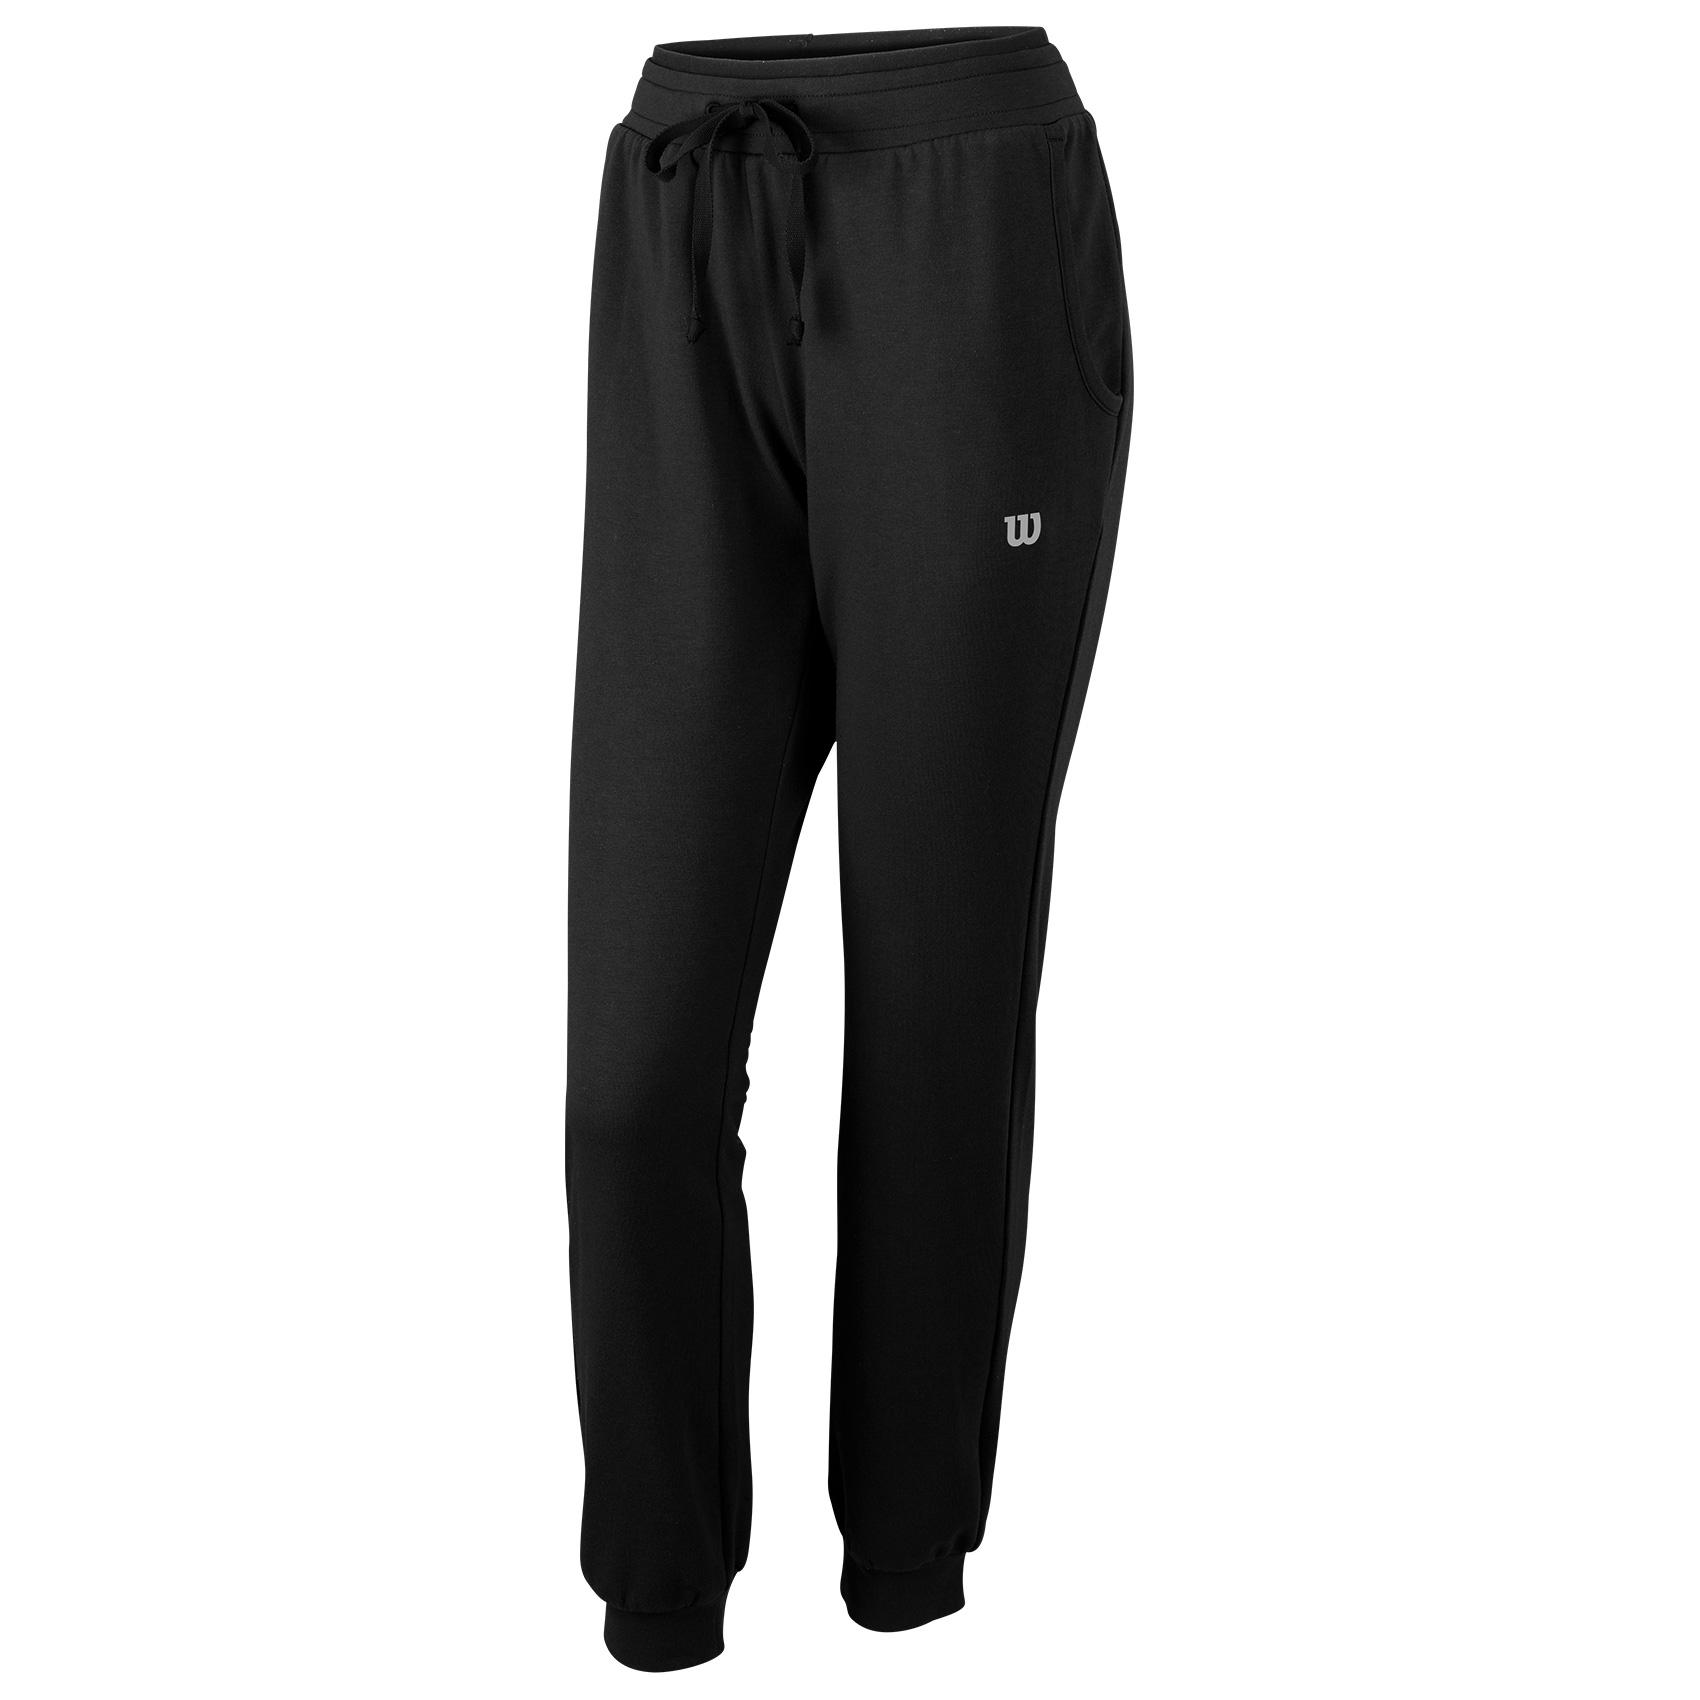 Wilson Rush Skinny Cotton Ladies Pants - L